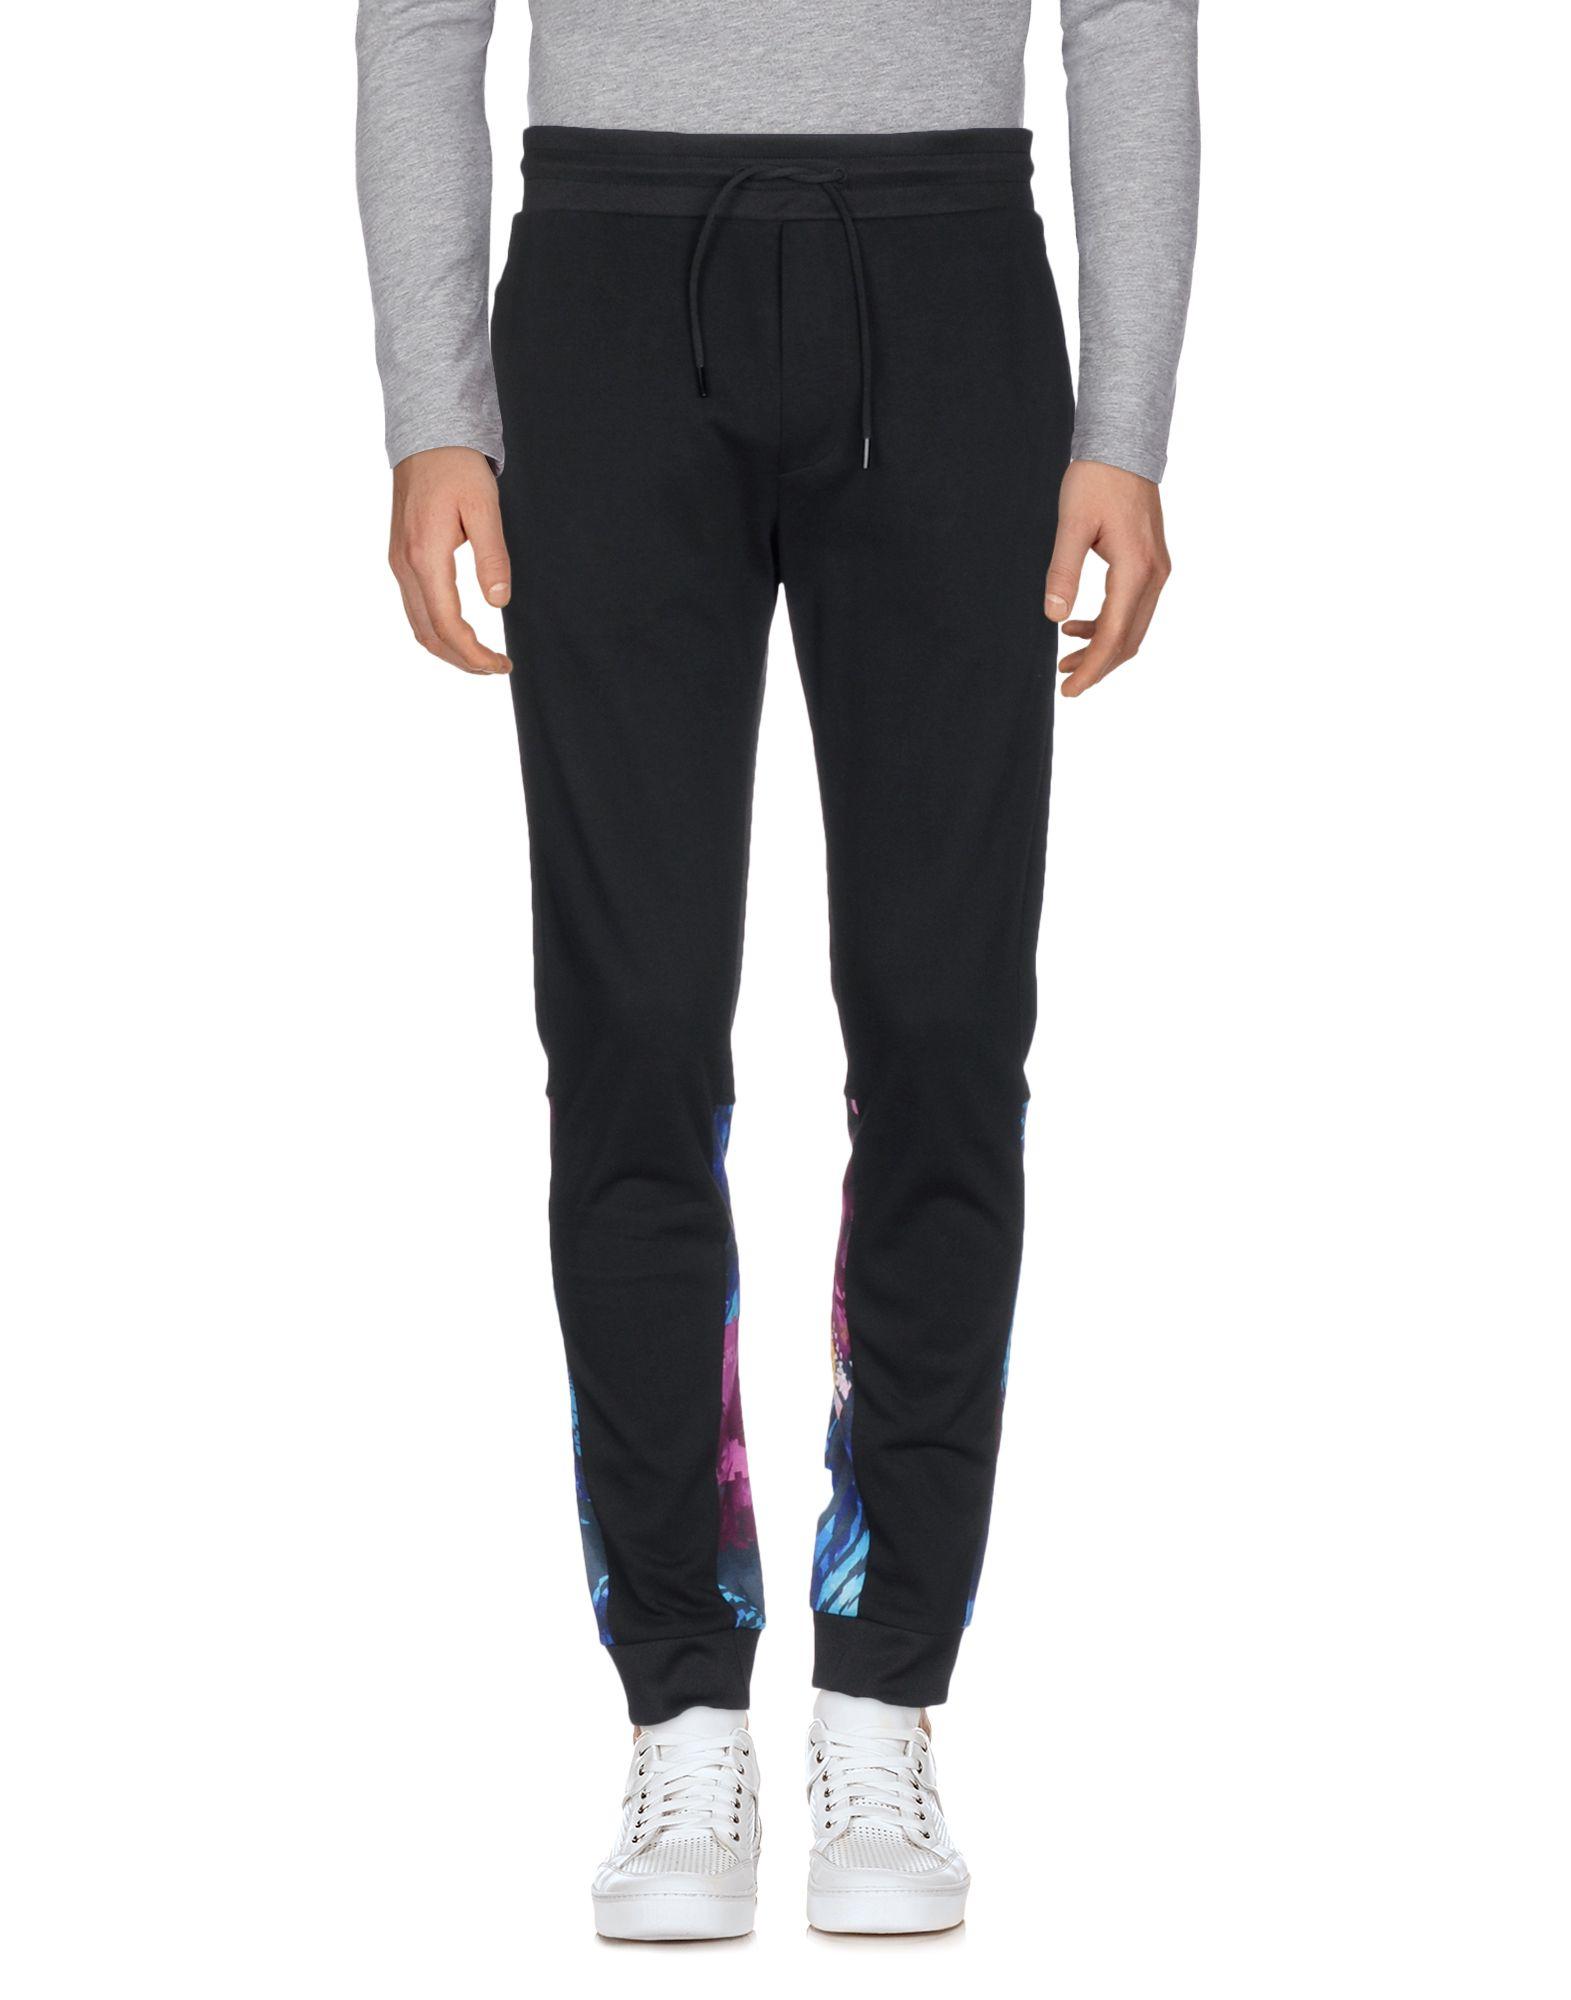 Pantalone Bikkembergs Uomo - Acquista online su